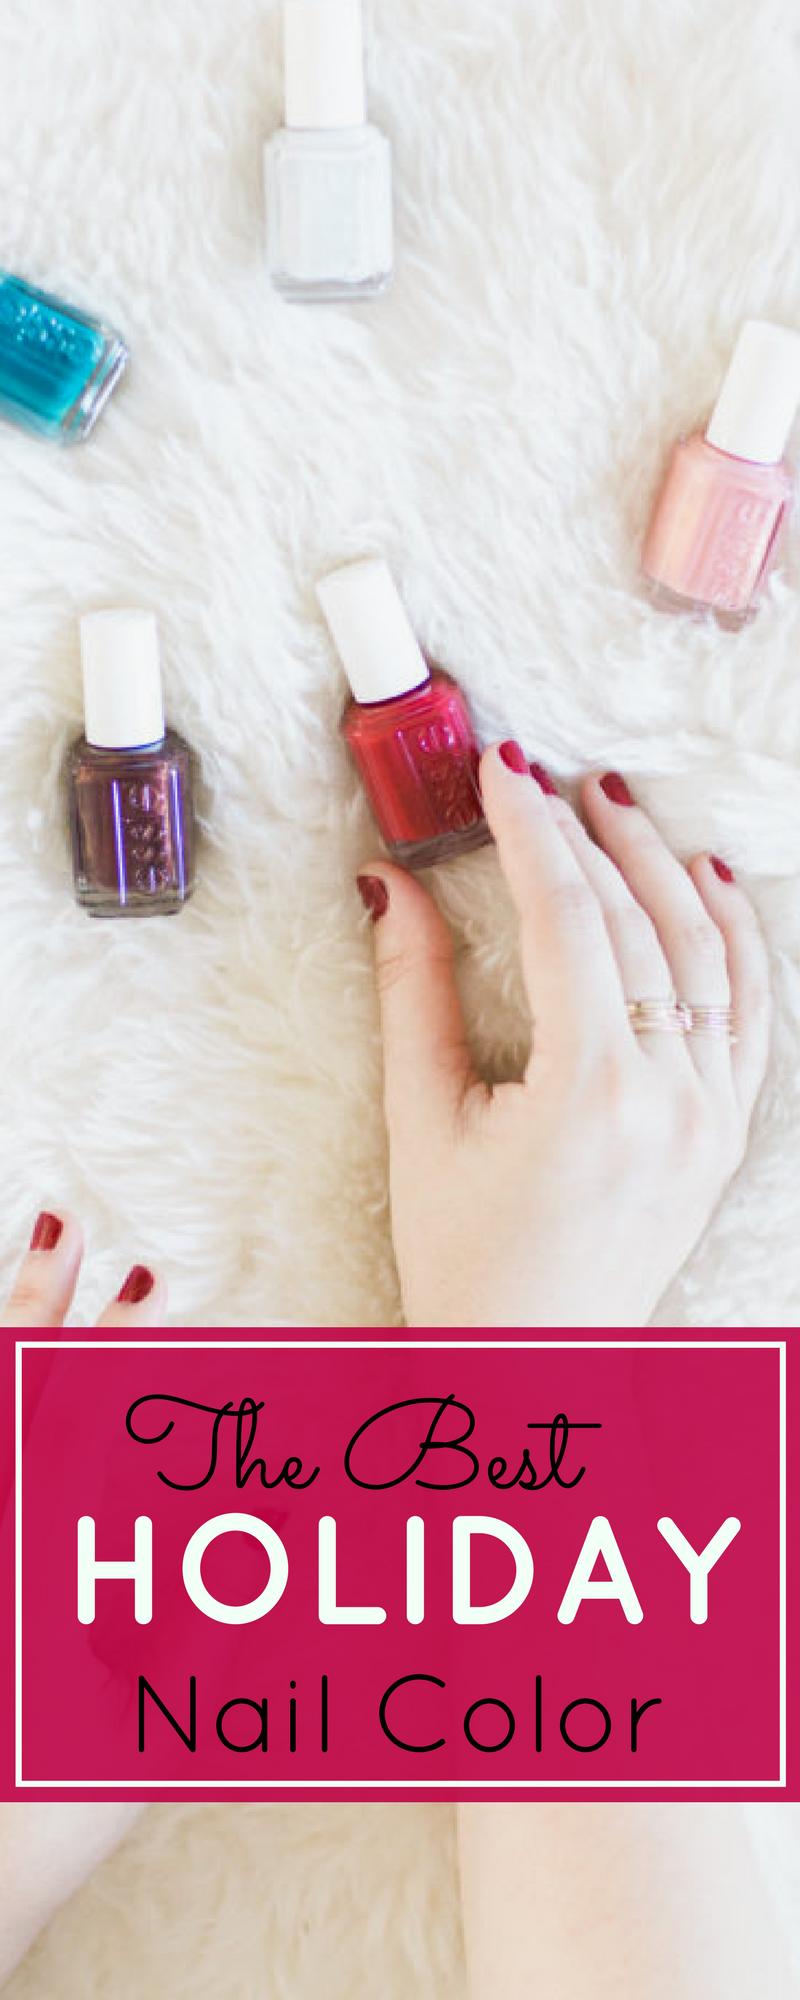 The perfect festive nail color for this holiday season. | glitterinc.com | @glitterinc